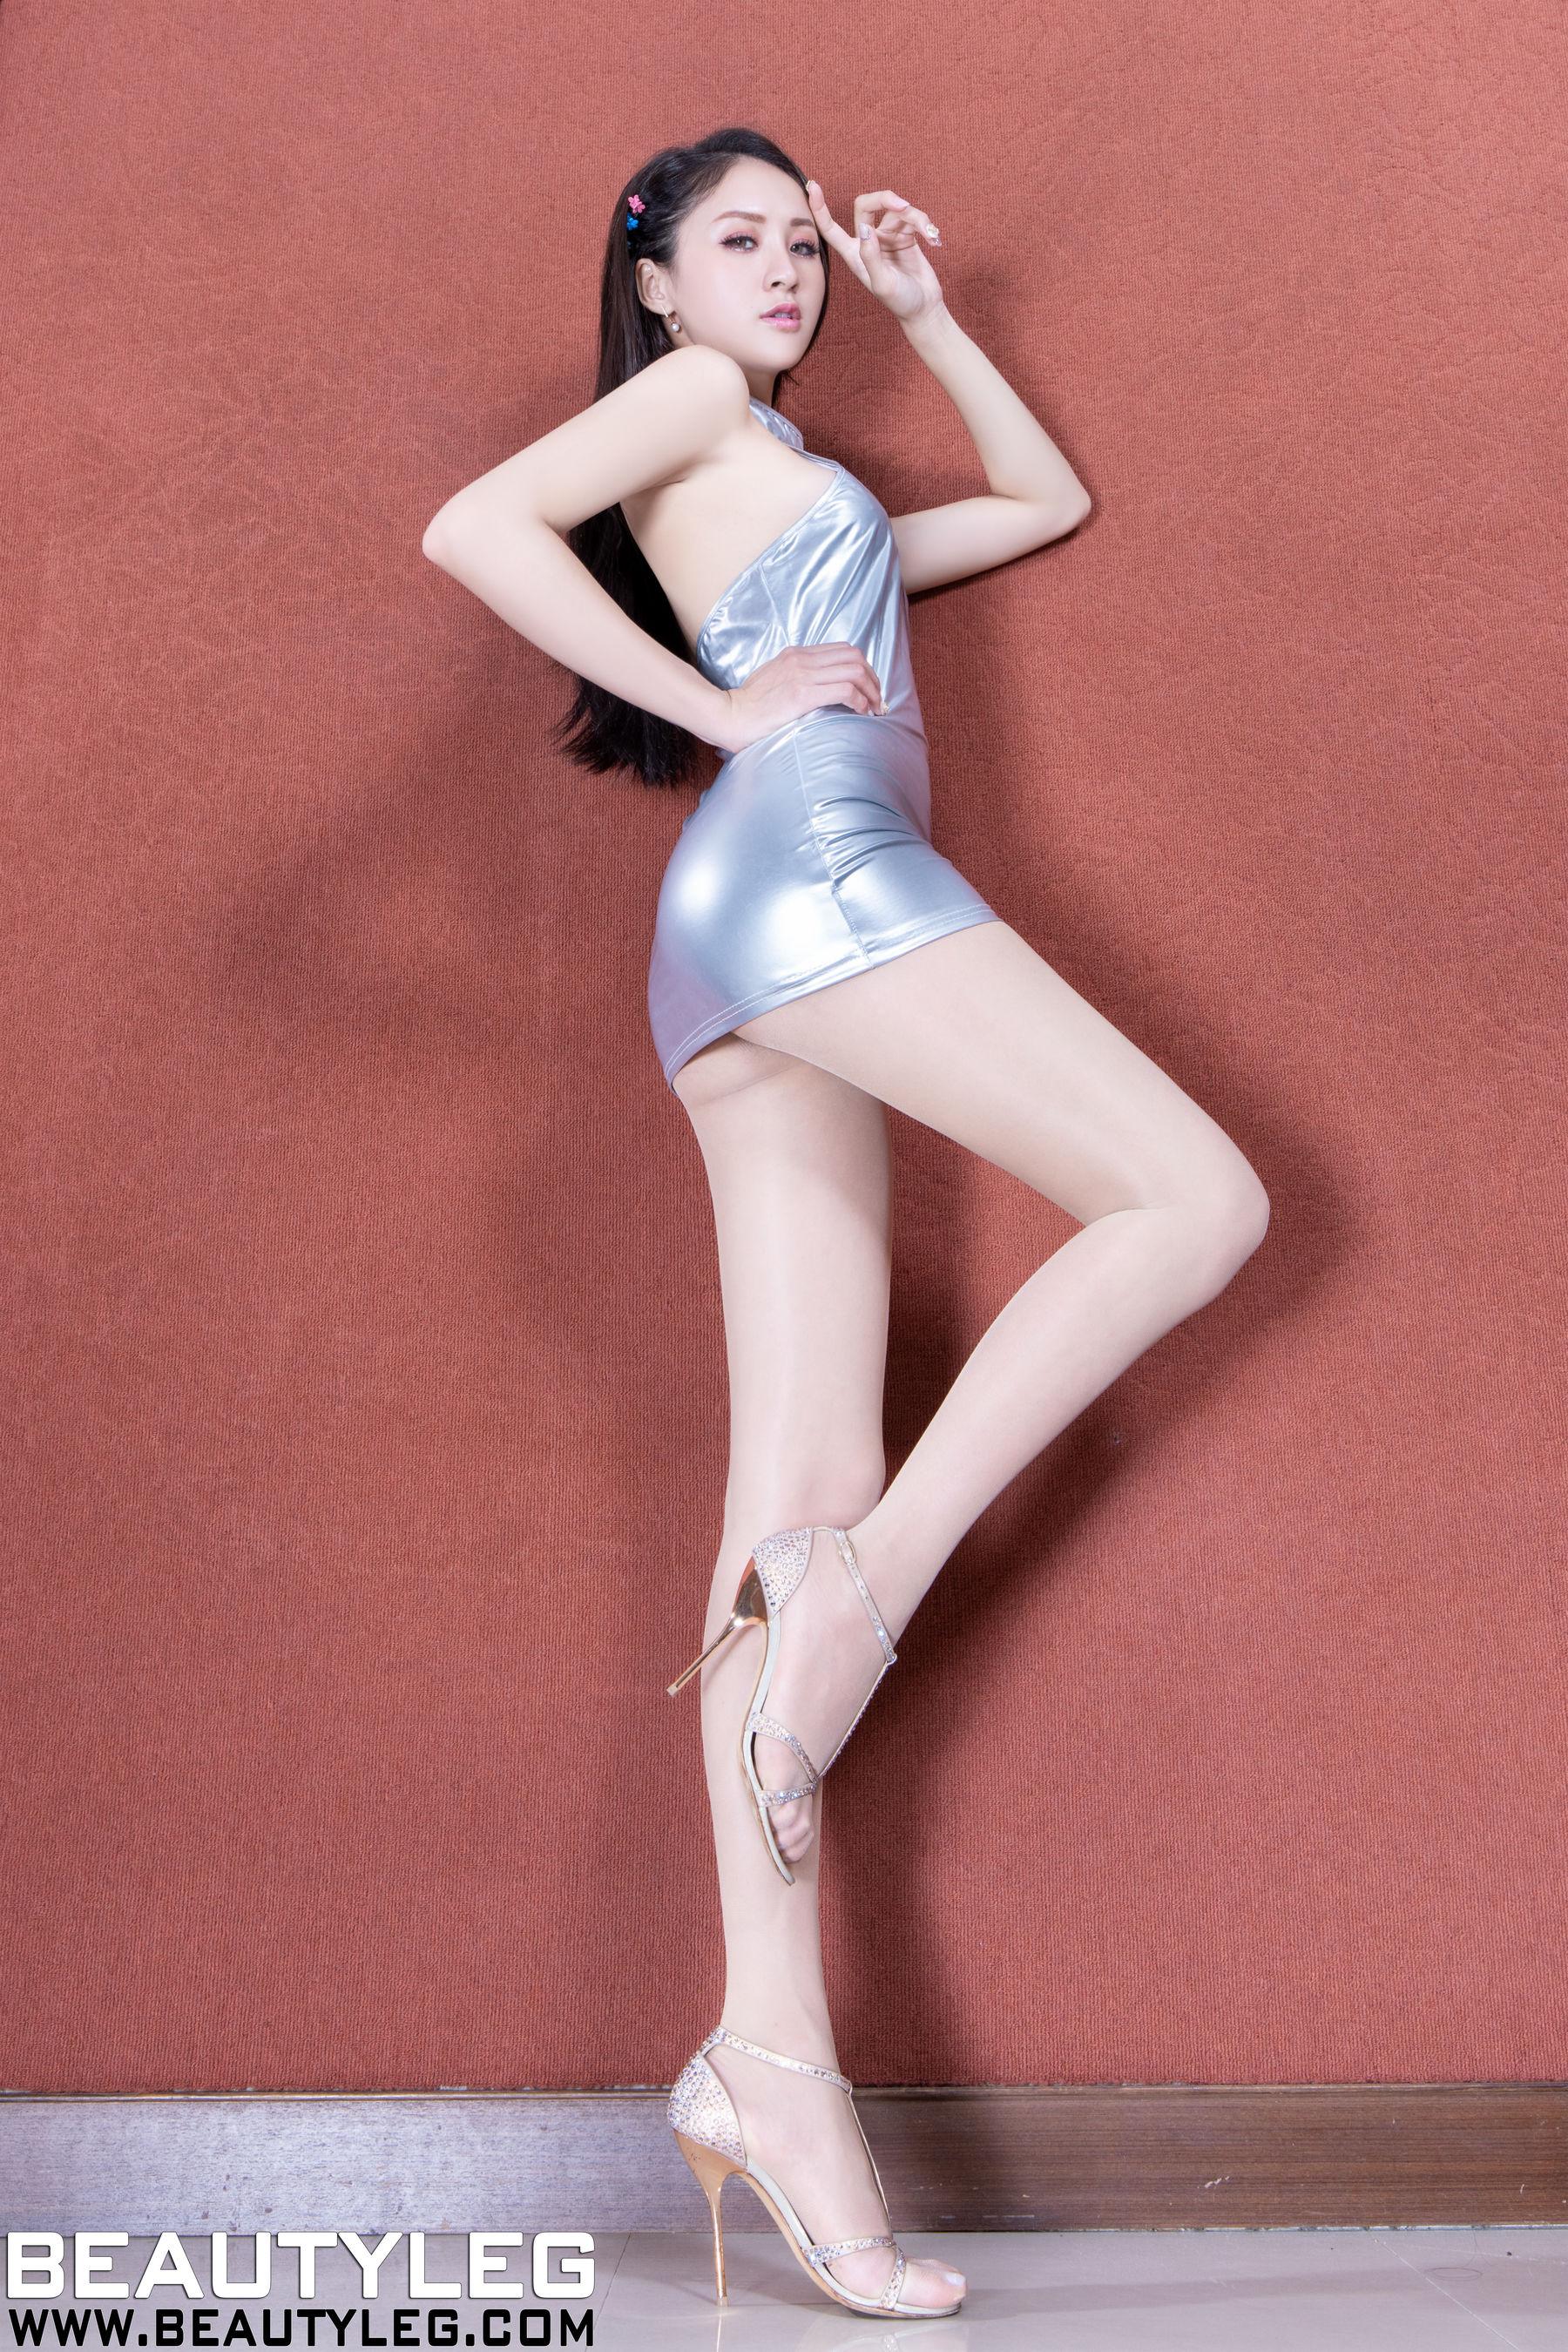 VOL.1782 [Beautyleg]肉丝美腿:Lola雪岑(腿模Lola)超高清个人性感漂亮大图(23P)